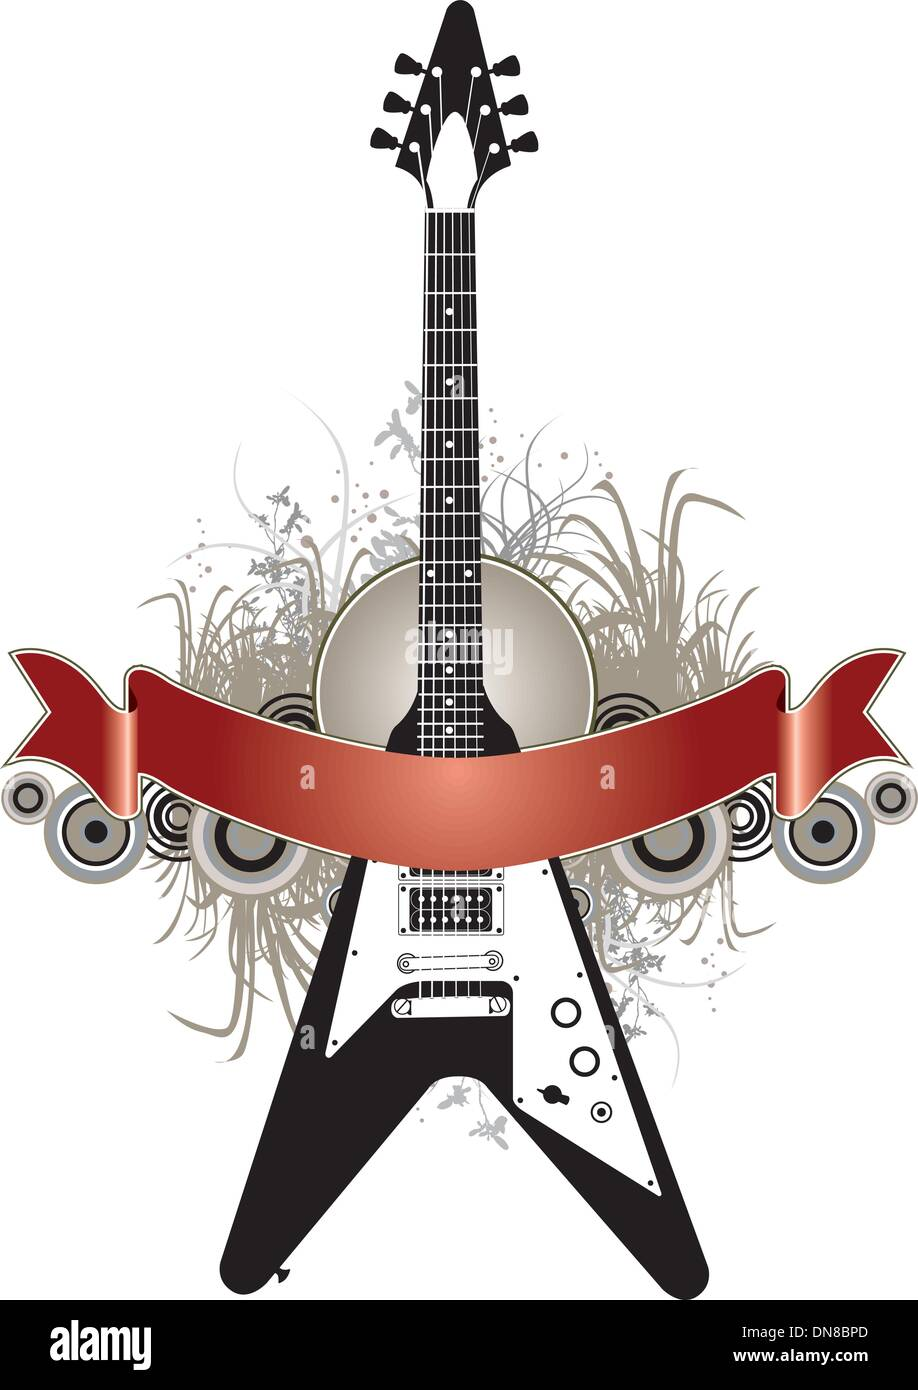 Guitar Vector Banner Design Template Stock Vector Image Art Alamy